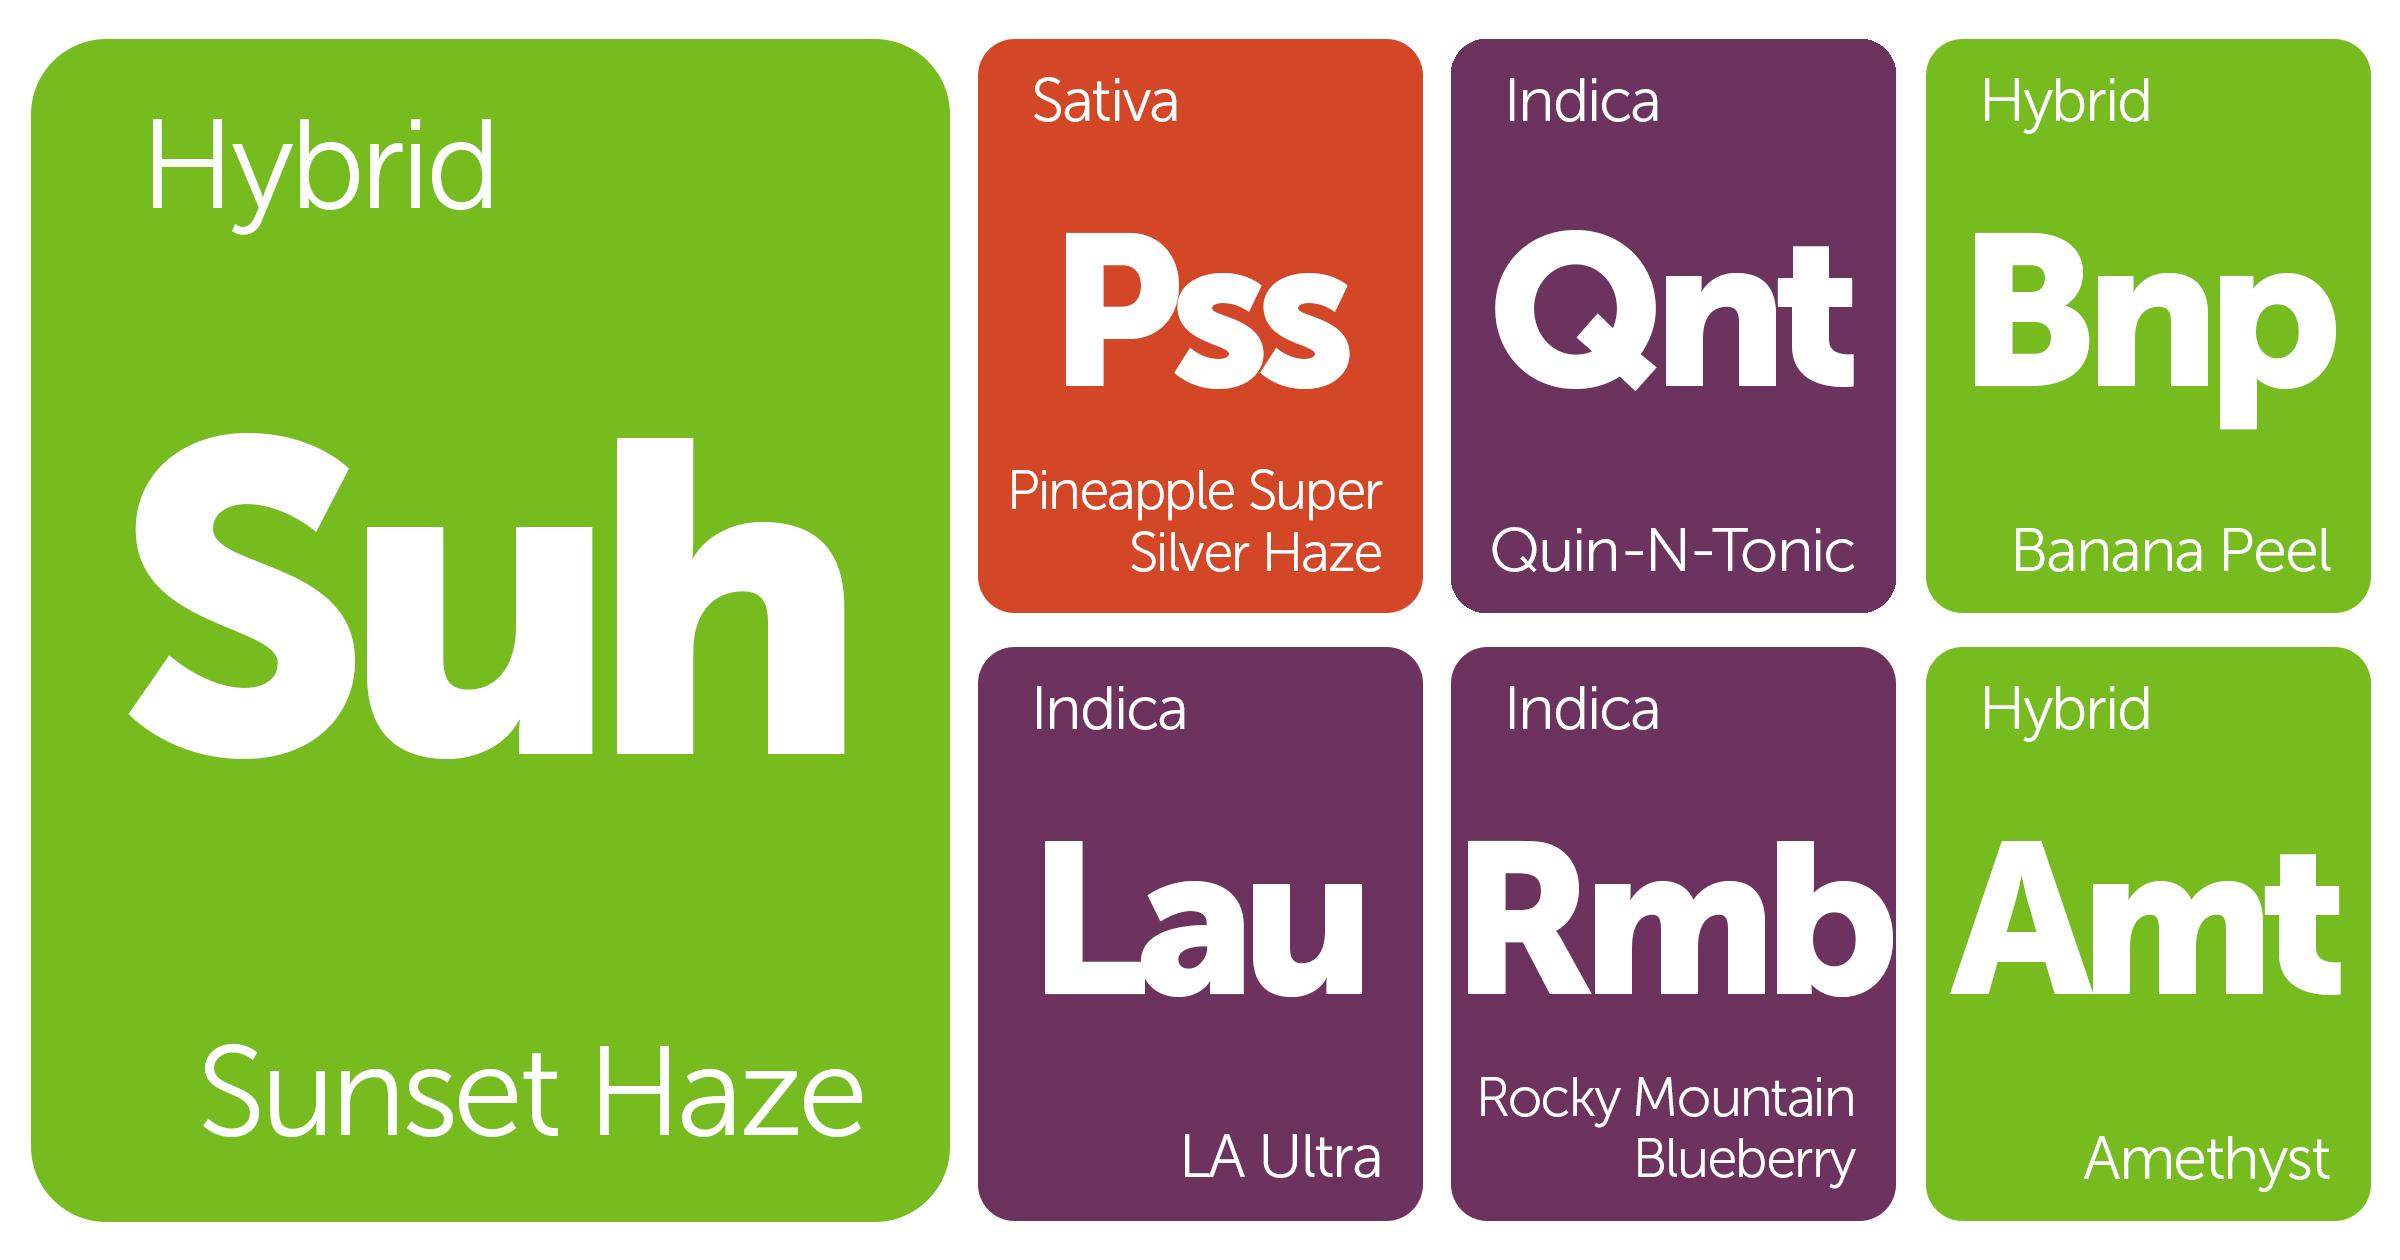 New Strains Alert: Sunset Haze, LA Ultra, Pineapple Super Silver Haze, Banana Peel, and More